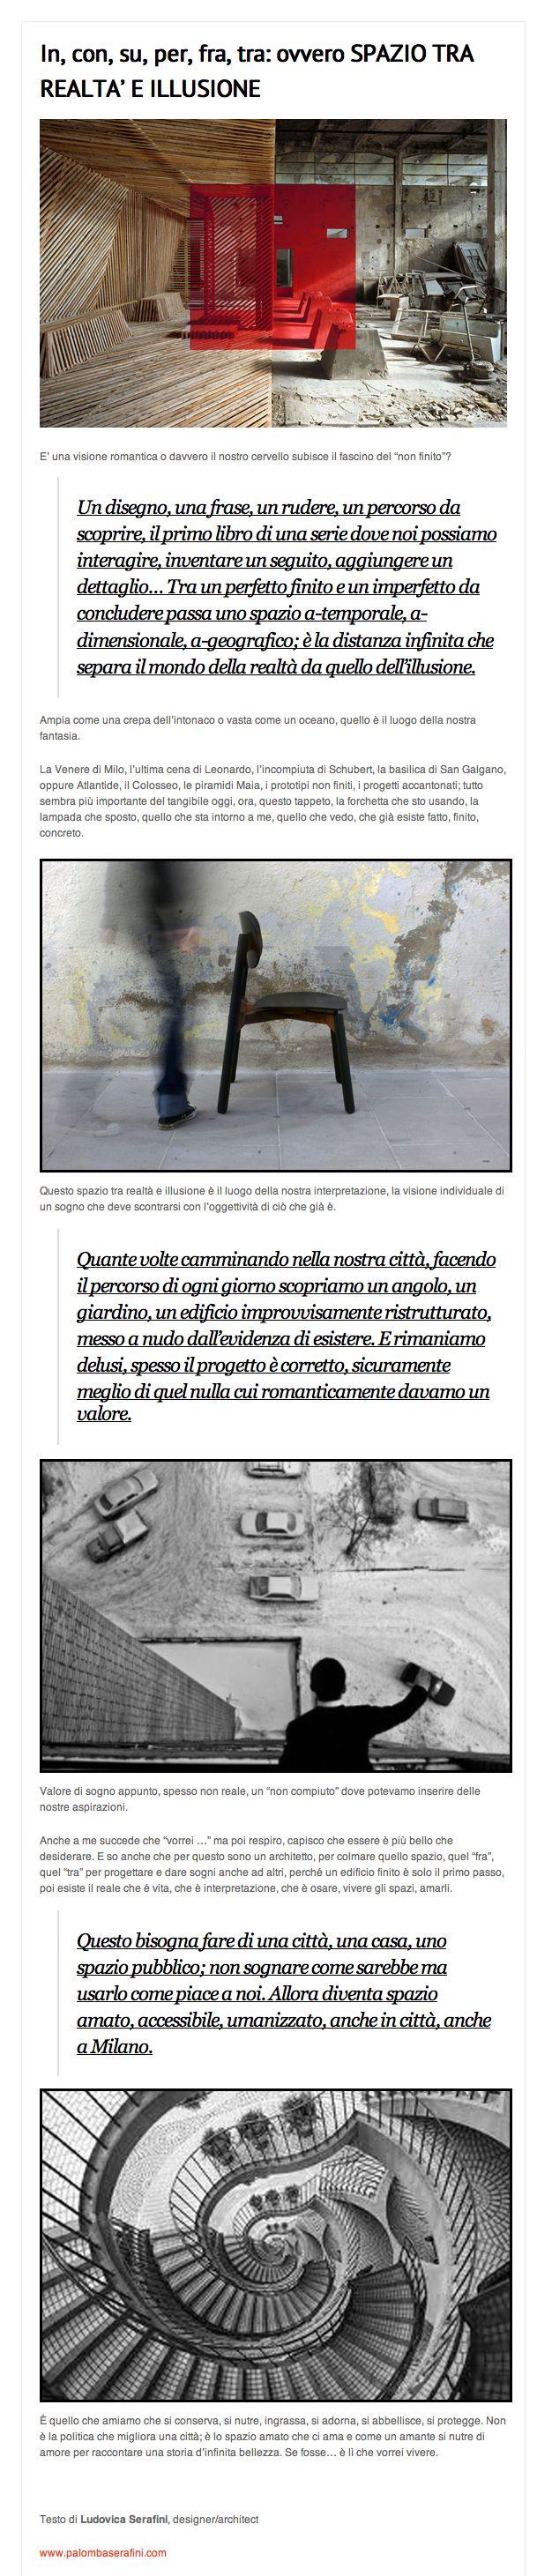 September 16th 2013 | Ludovica Palomba #blog for @casatrend+ | http://www.casatrendmag.it/1532/